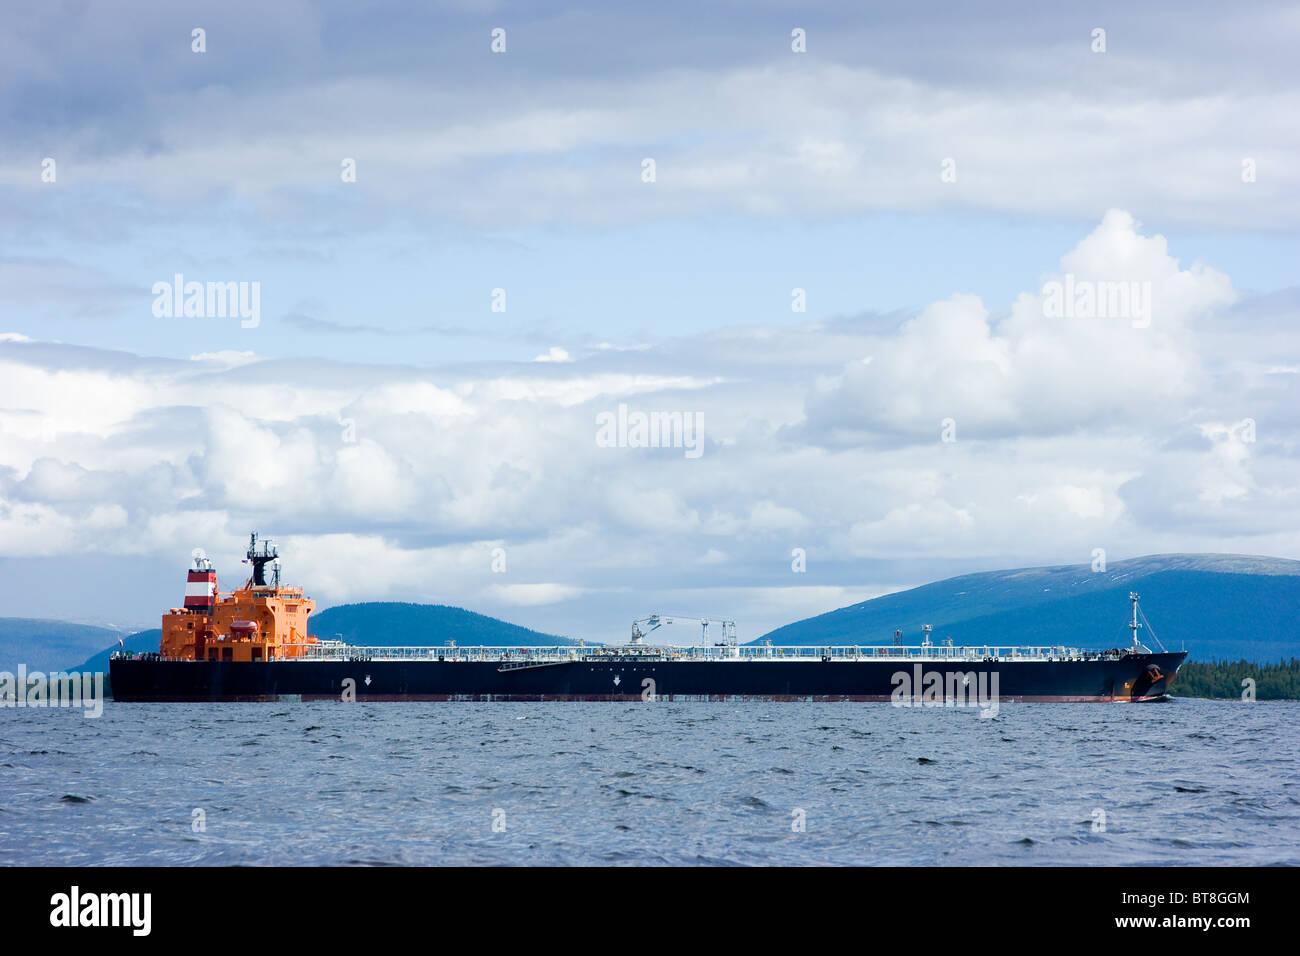 Tank Barge Stock Photos & Tank Barge Stock Images - Alamy